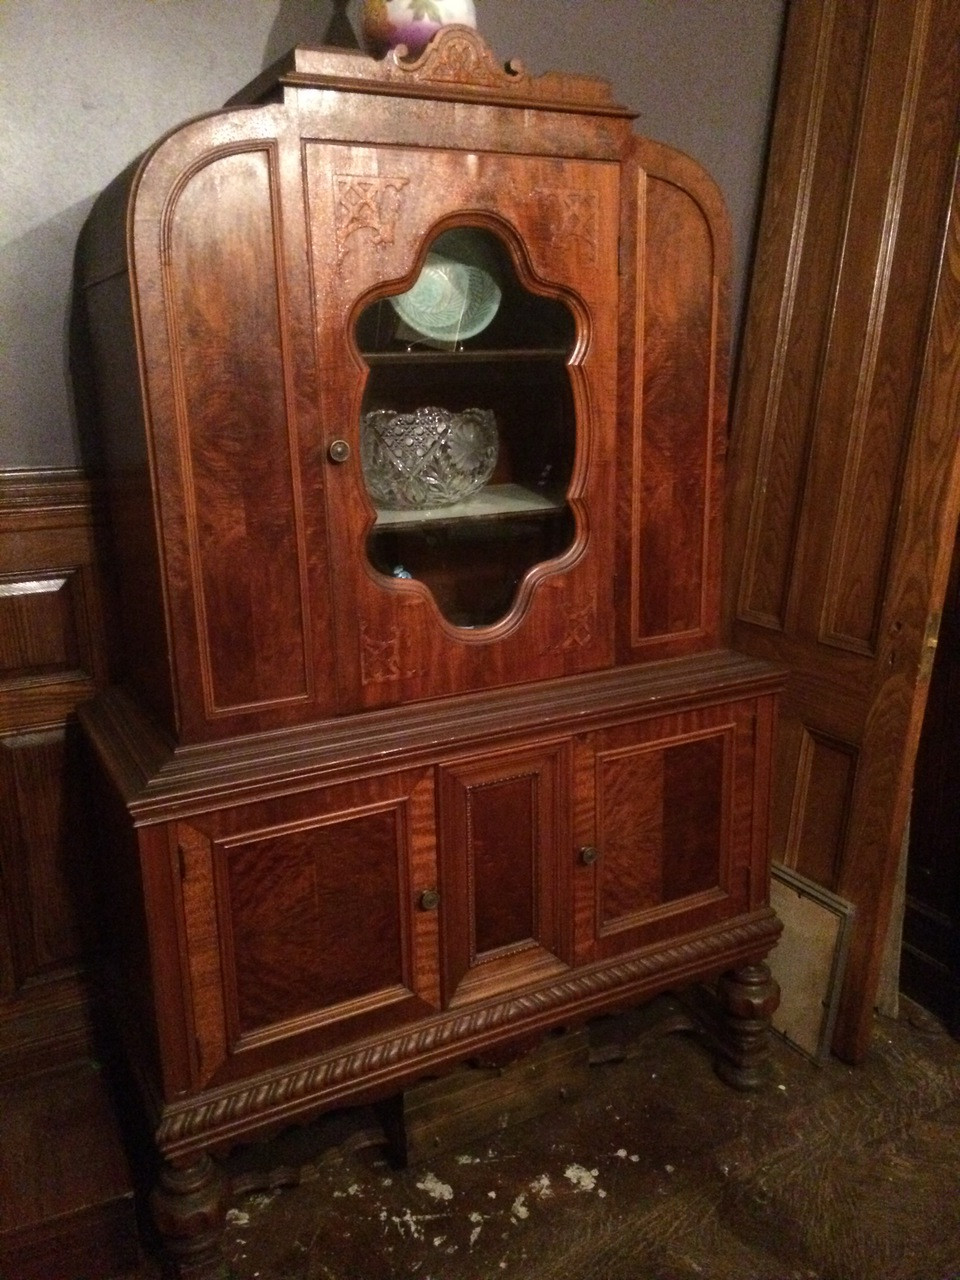 Antique Depression Era Carved Arch Top China Cabinet - Forgotten Furniture